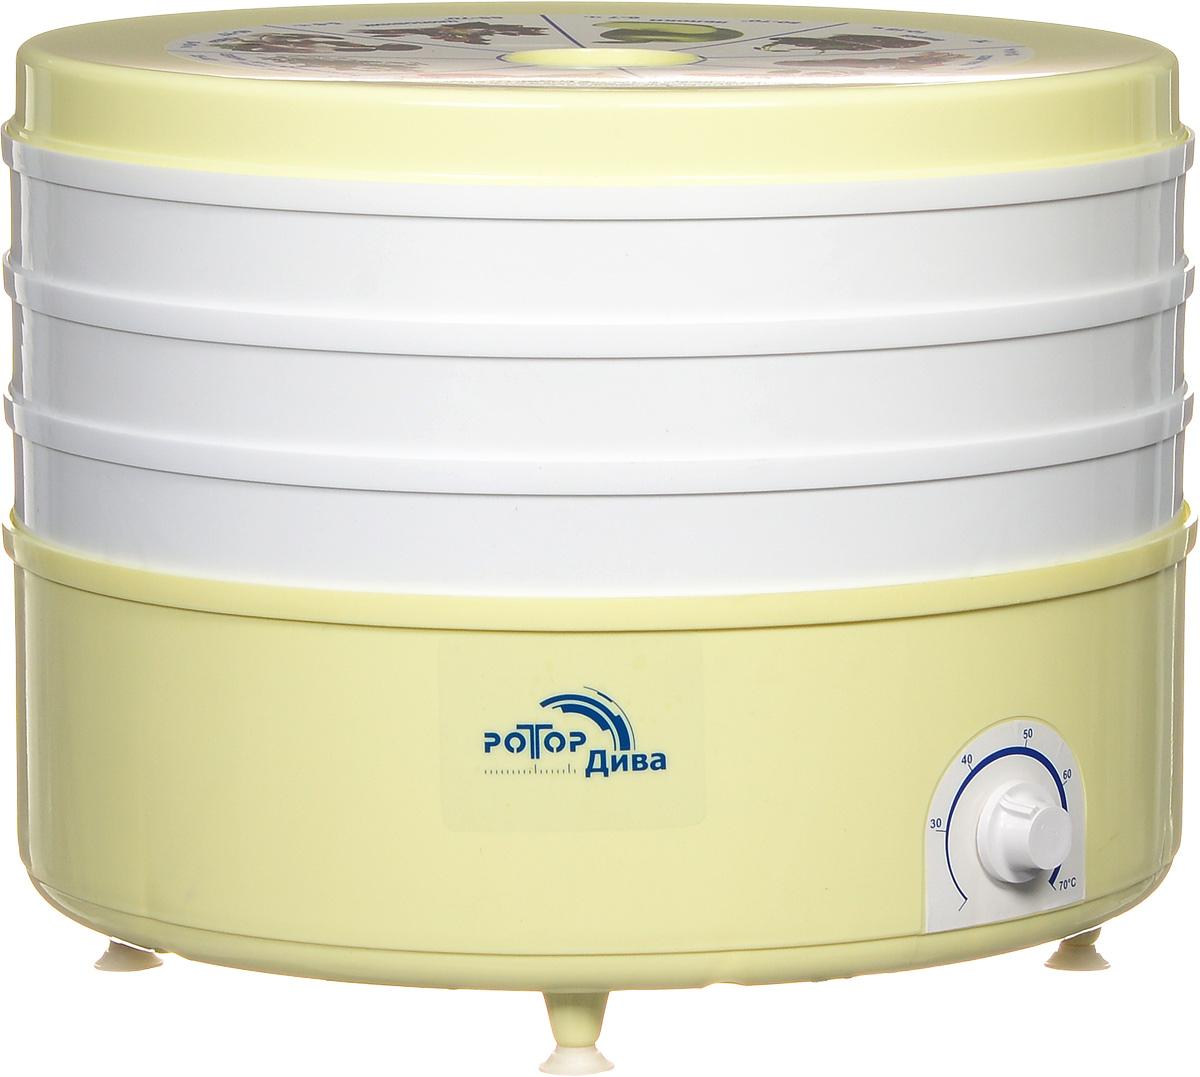 Ротор Дива СШ-007-05 сушилка для овощей СО Р3 5 *